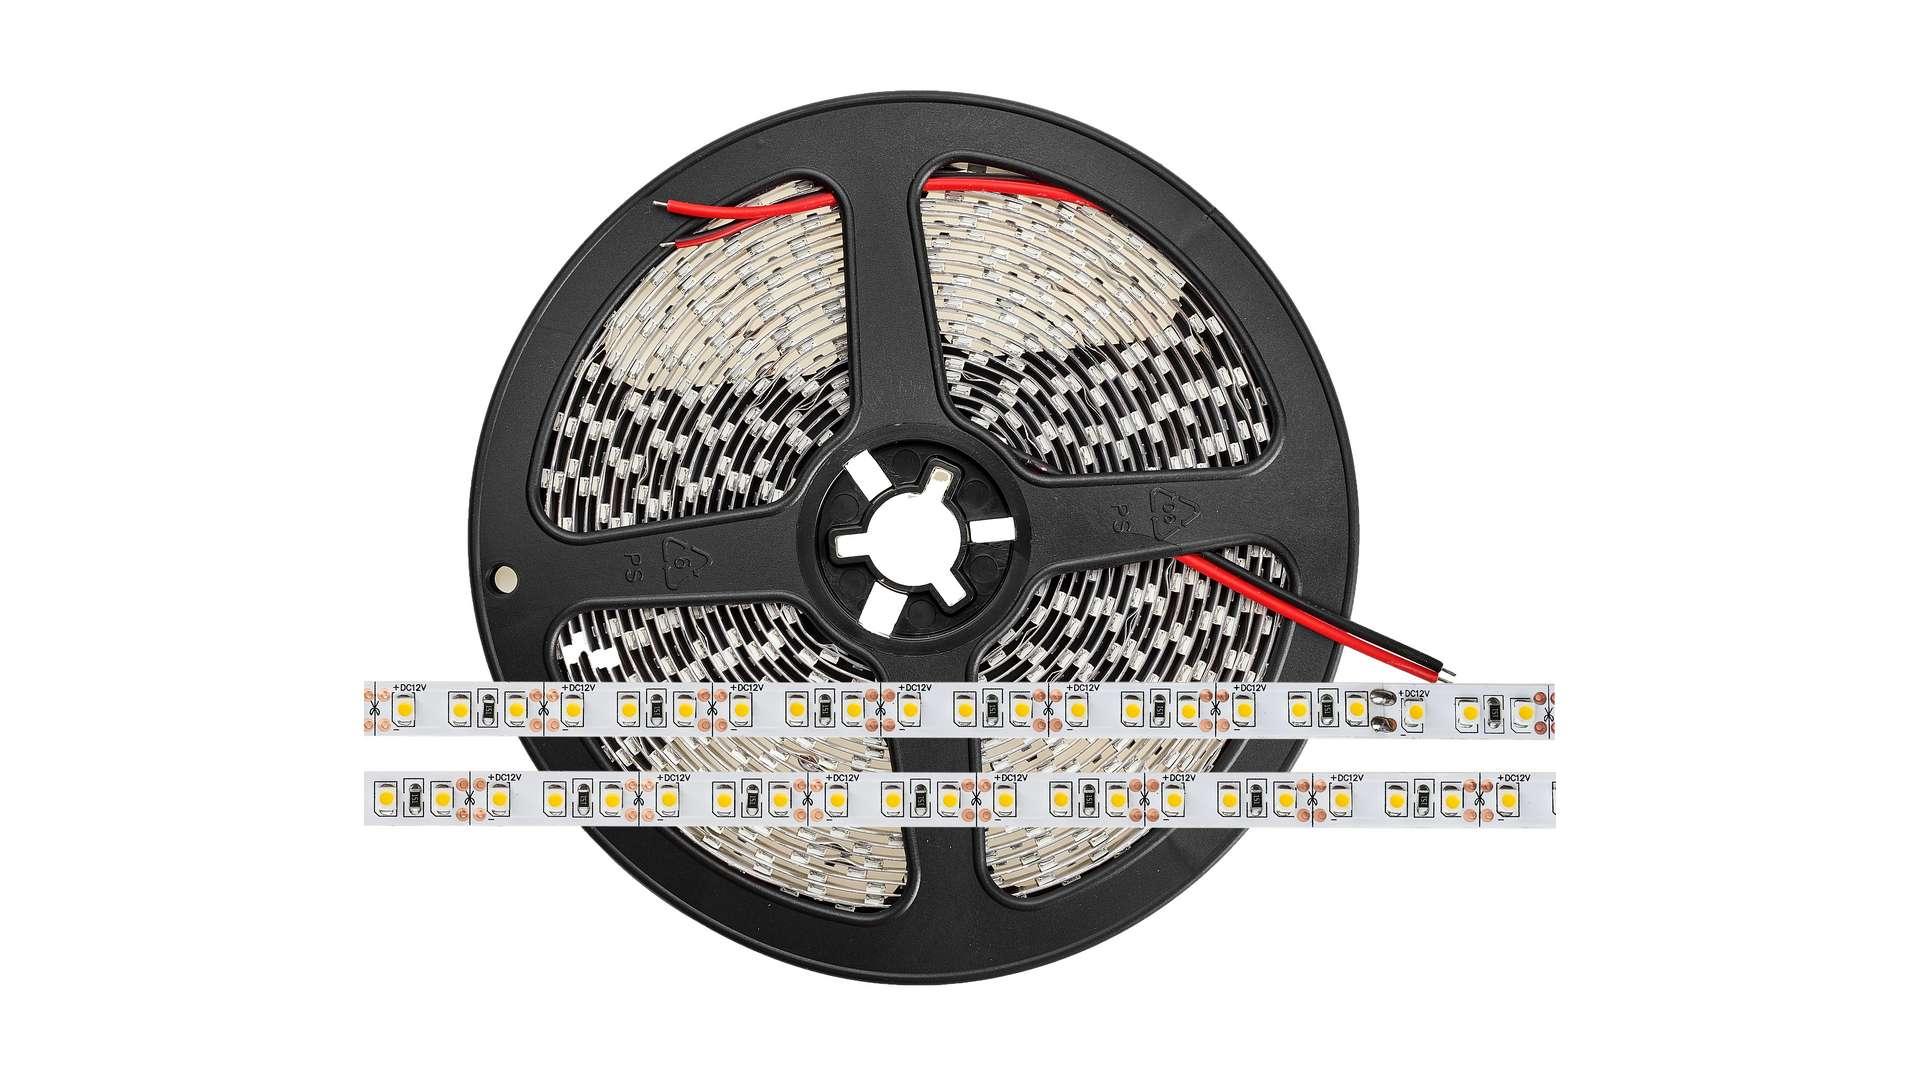 Taśma 600 LED 120 LED/m 3528 SMD, Biały Ciepły